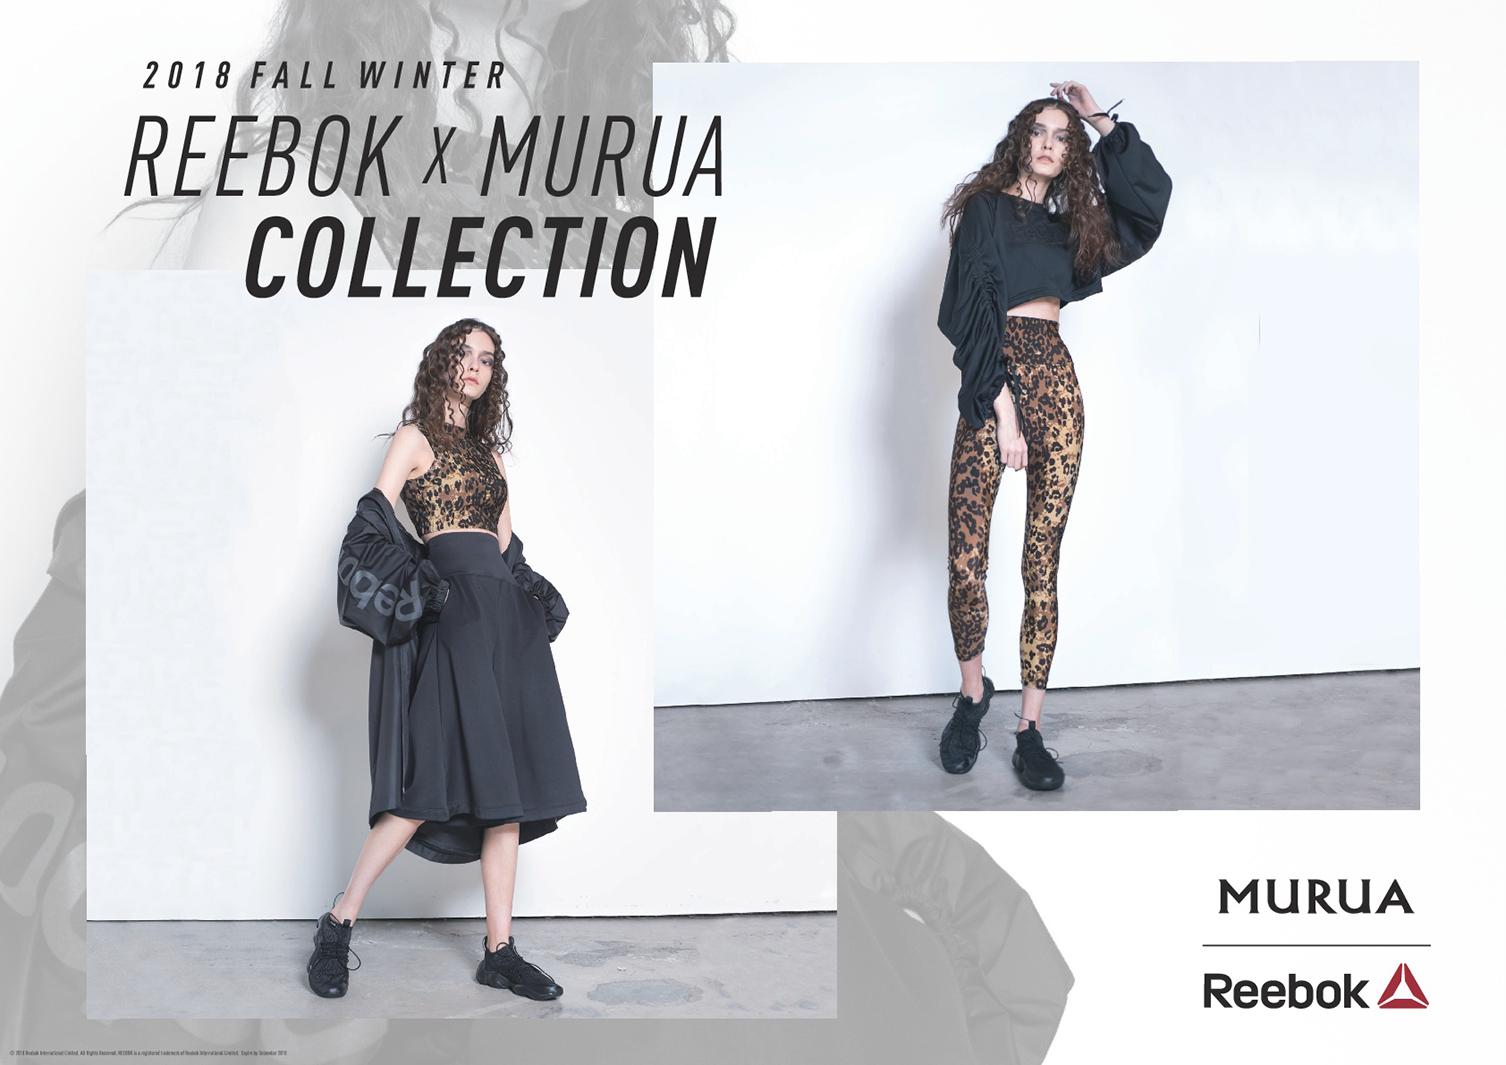 「MURUA」×「Reebok」がコラボ(提供写真)